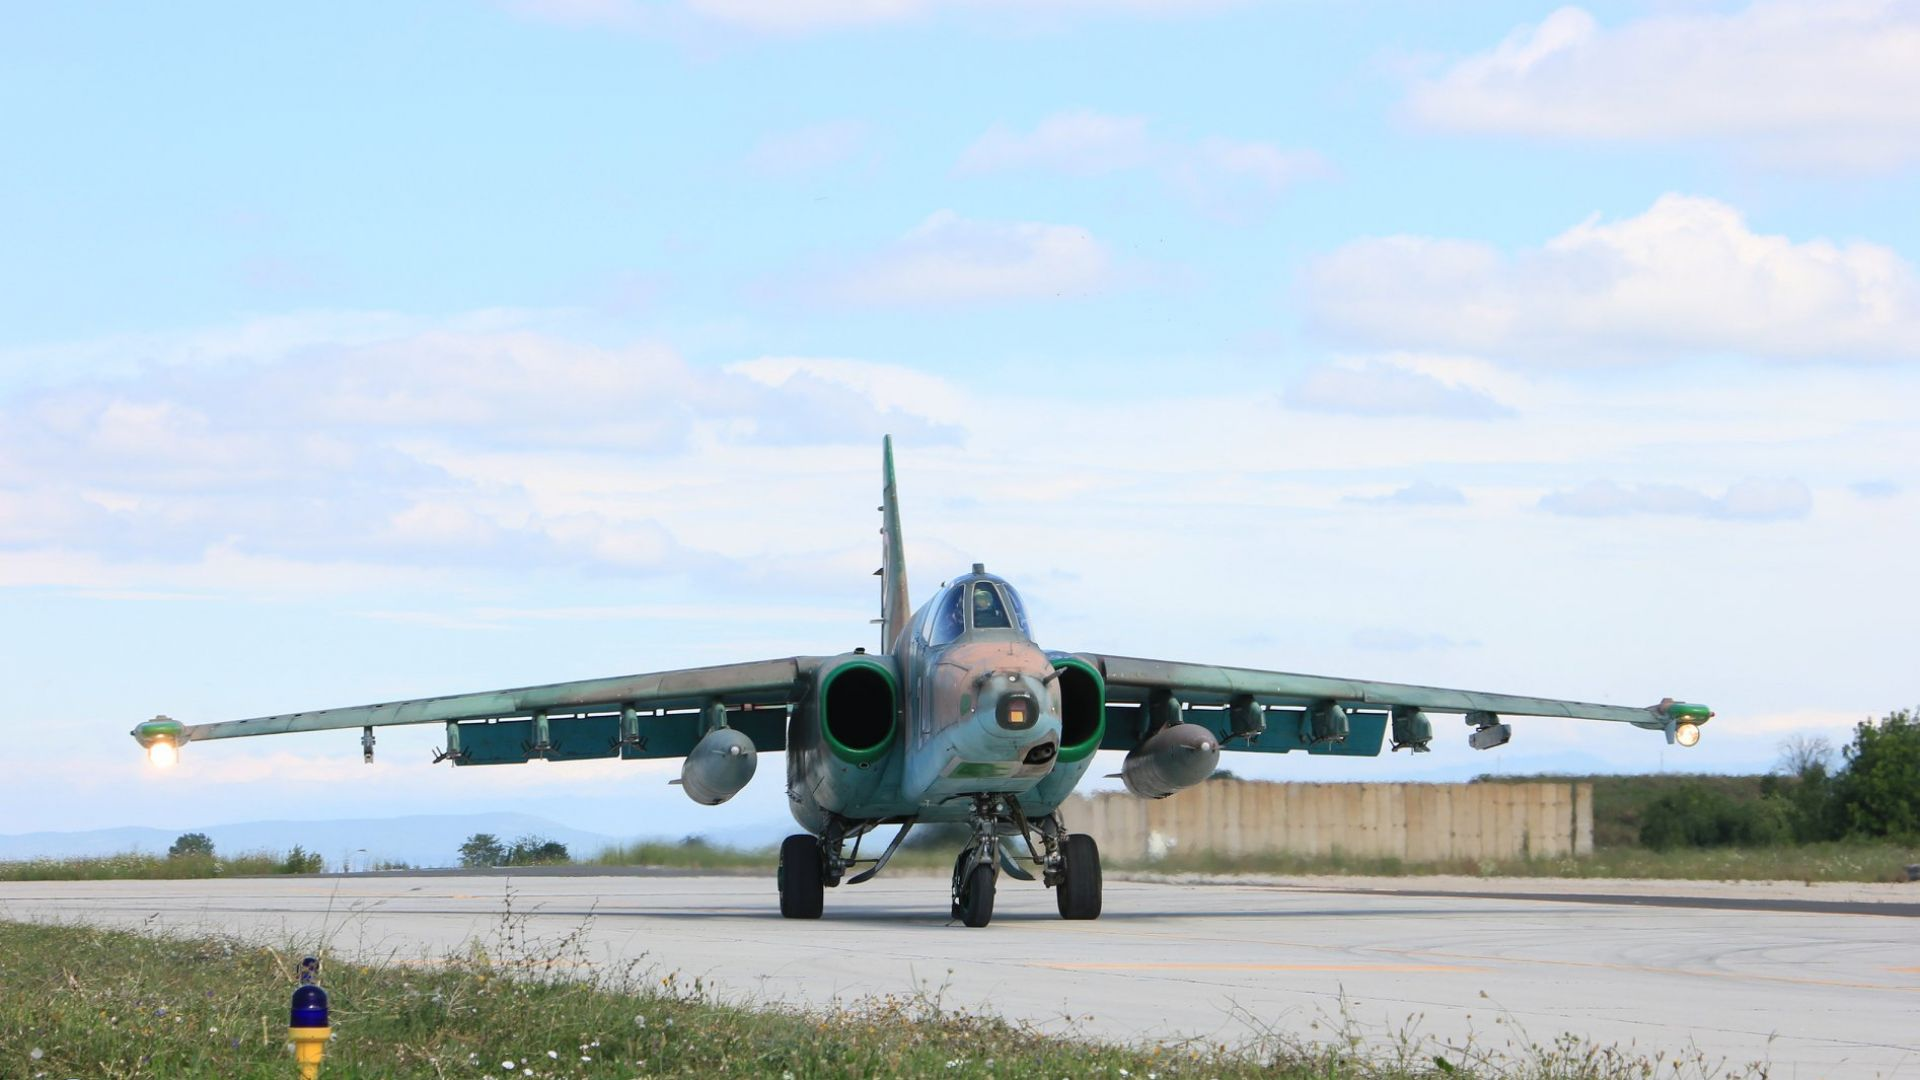 Военното министерство отговори на БСП за ремонта на Су-25